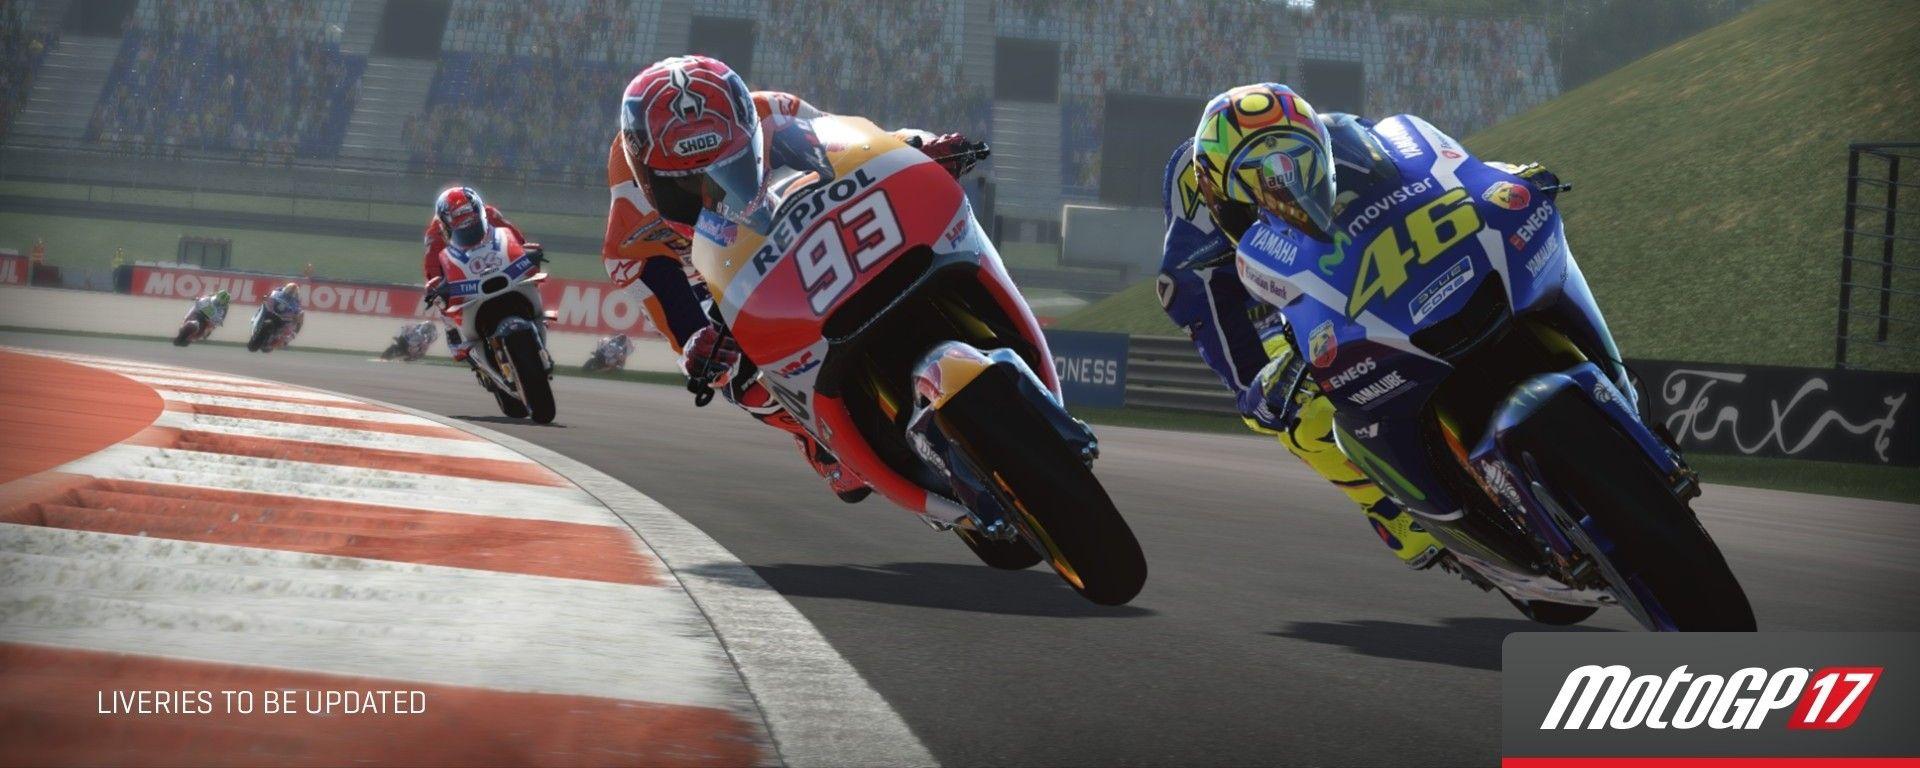 MotoGP17 eSport Championship: schermata 1